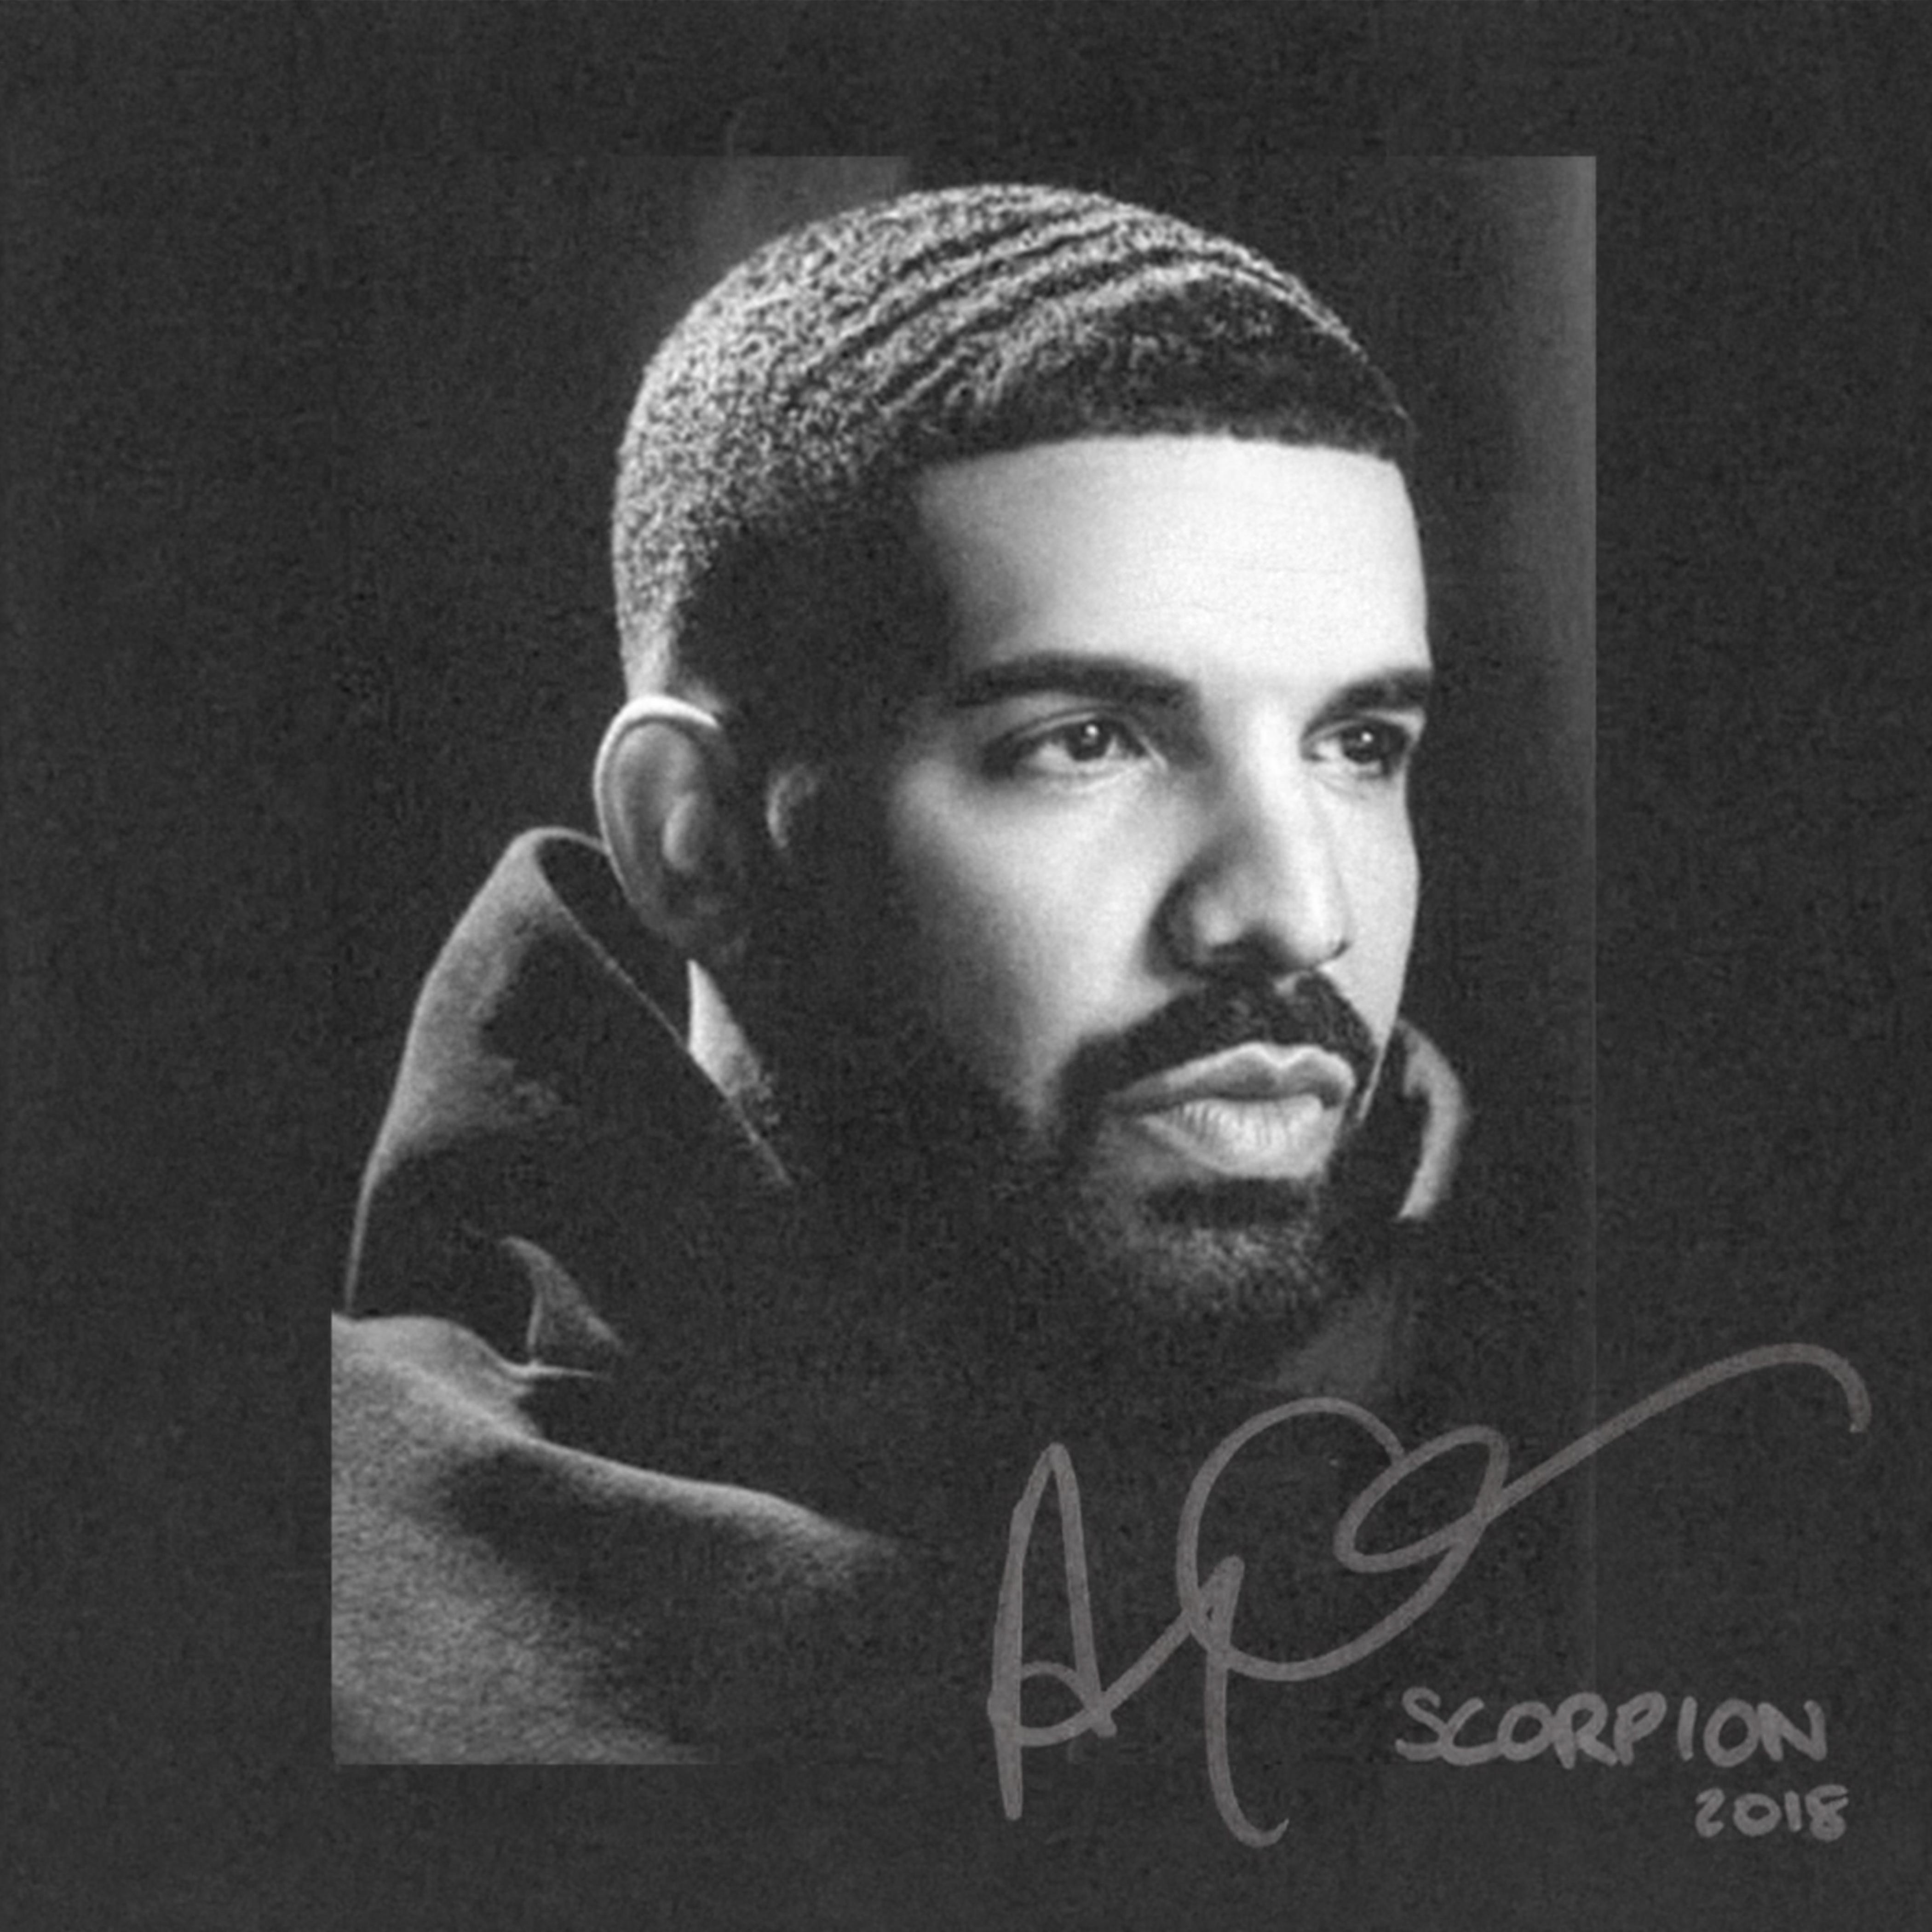 Drake - Scorpion (Edited) (CD)